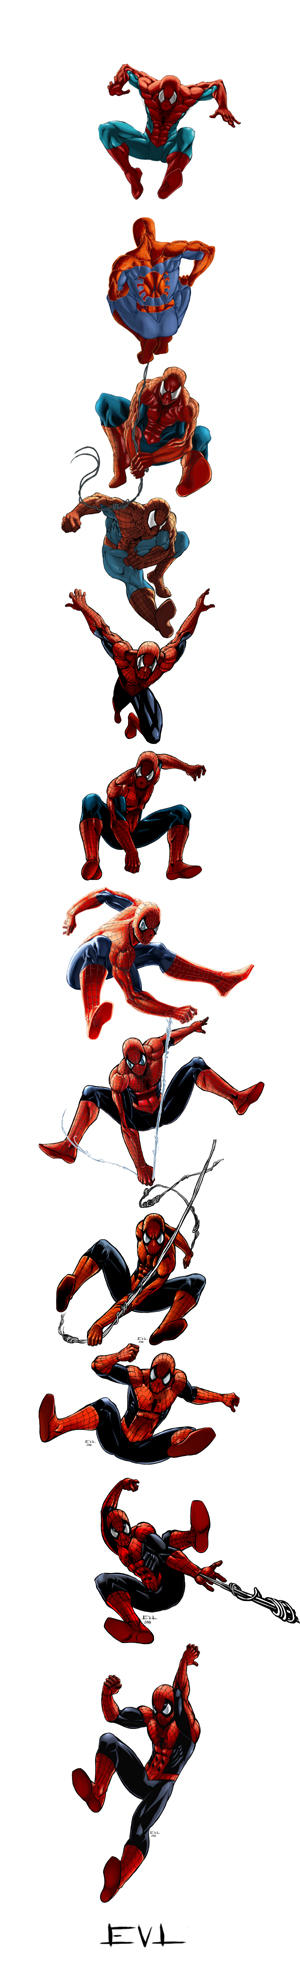 EVL Timeline of Spiderman by ErikVonLehmann